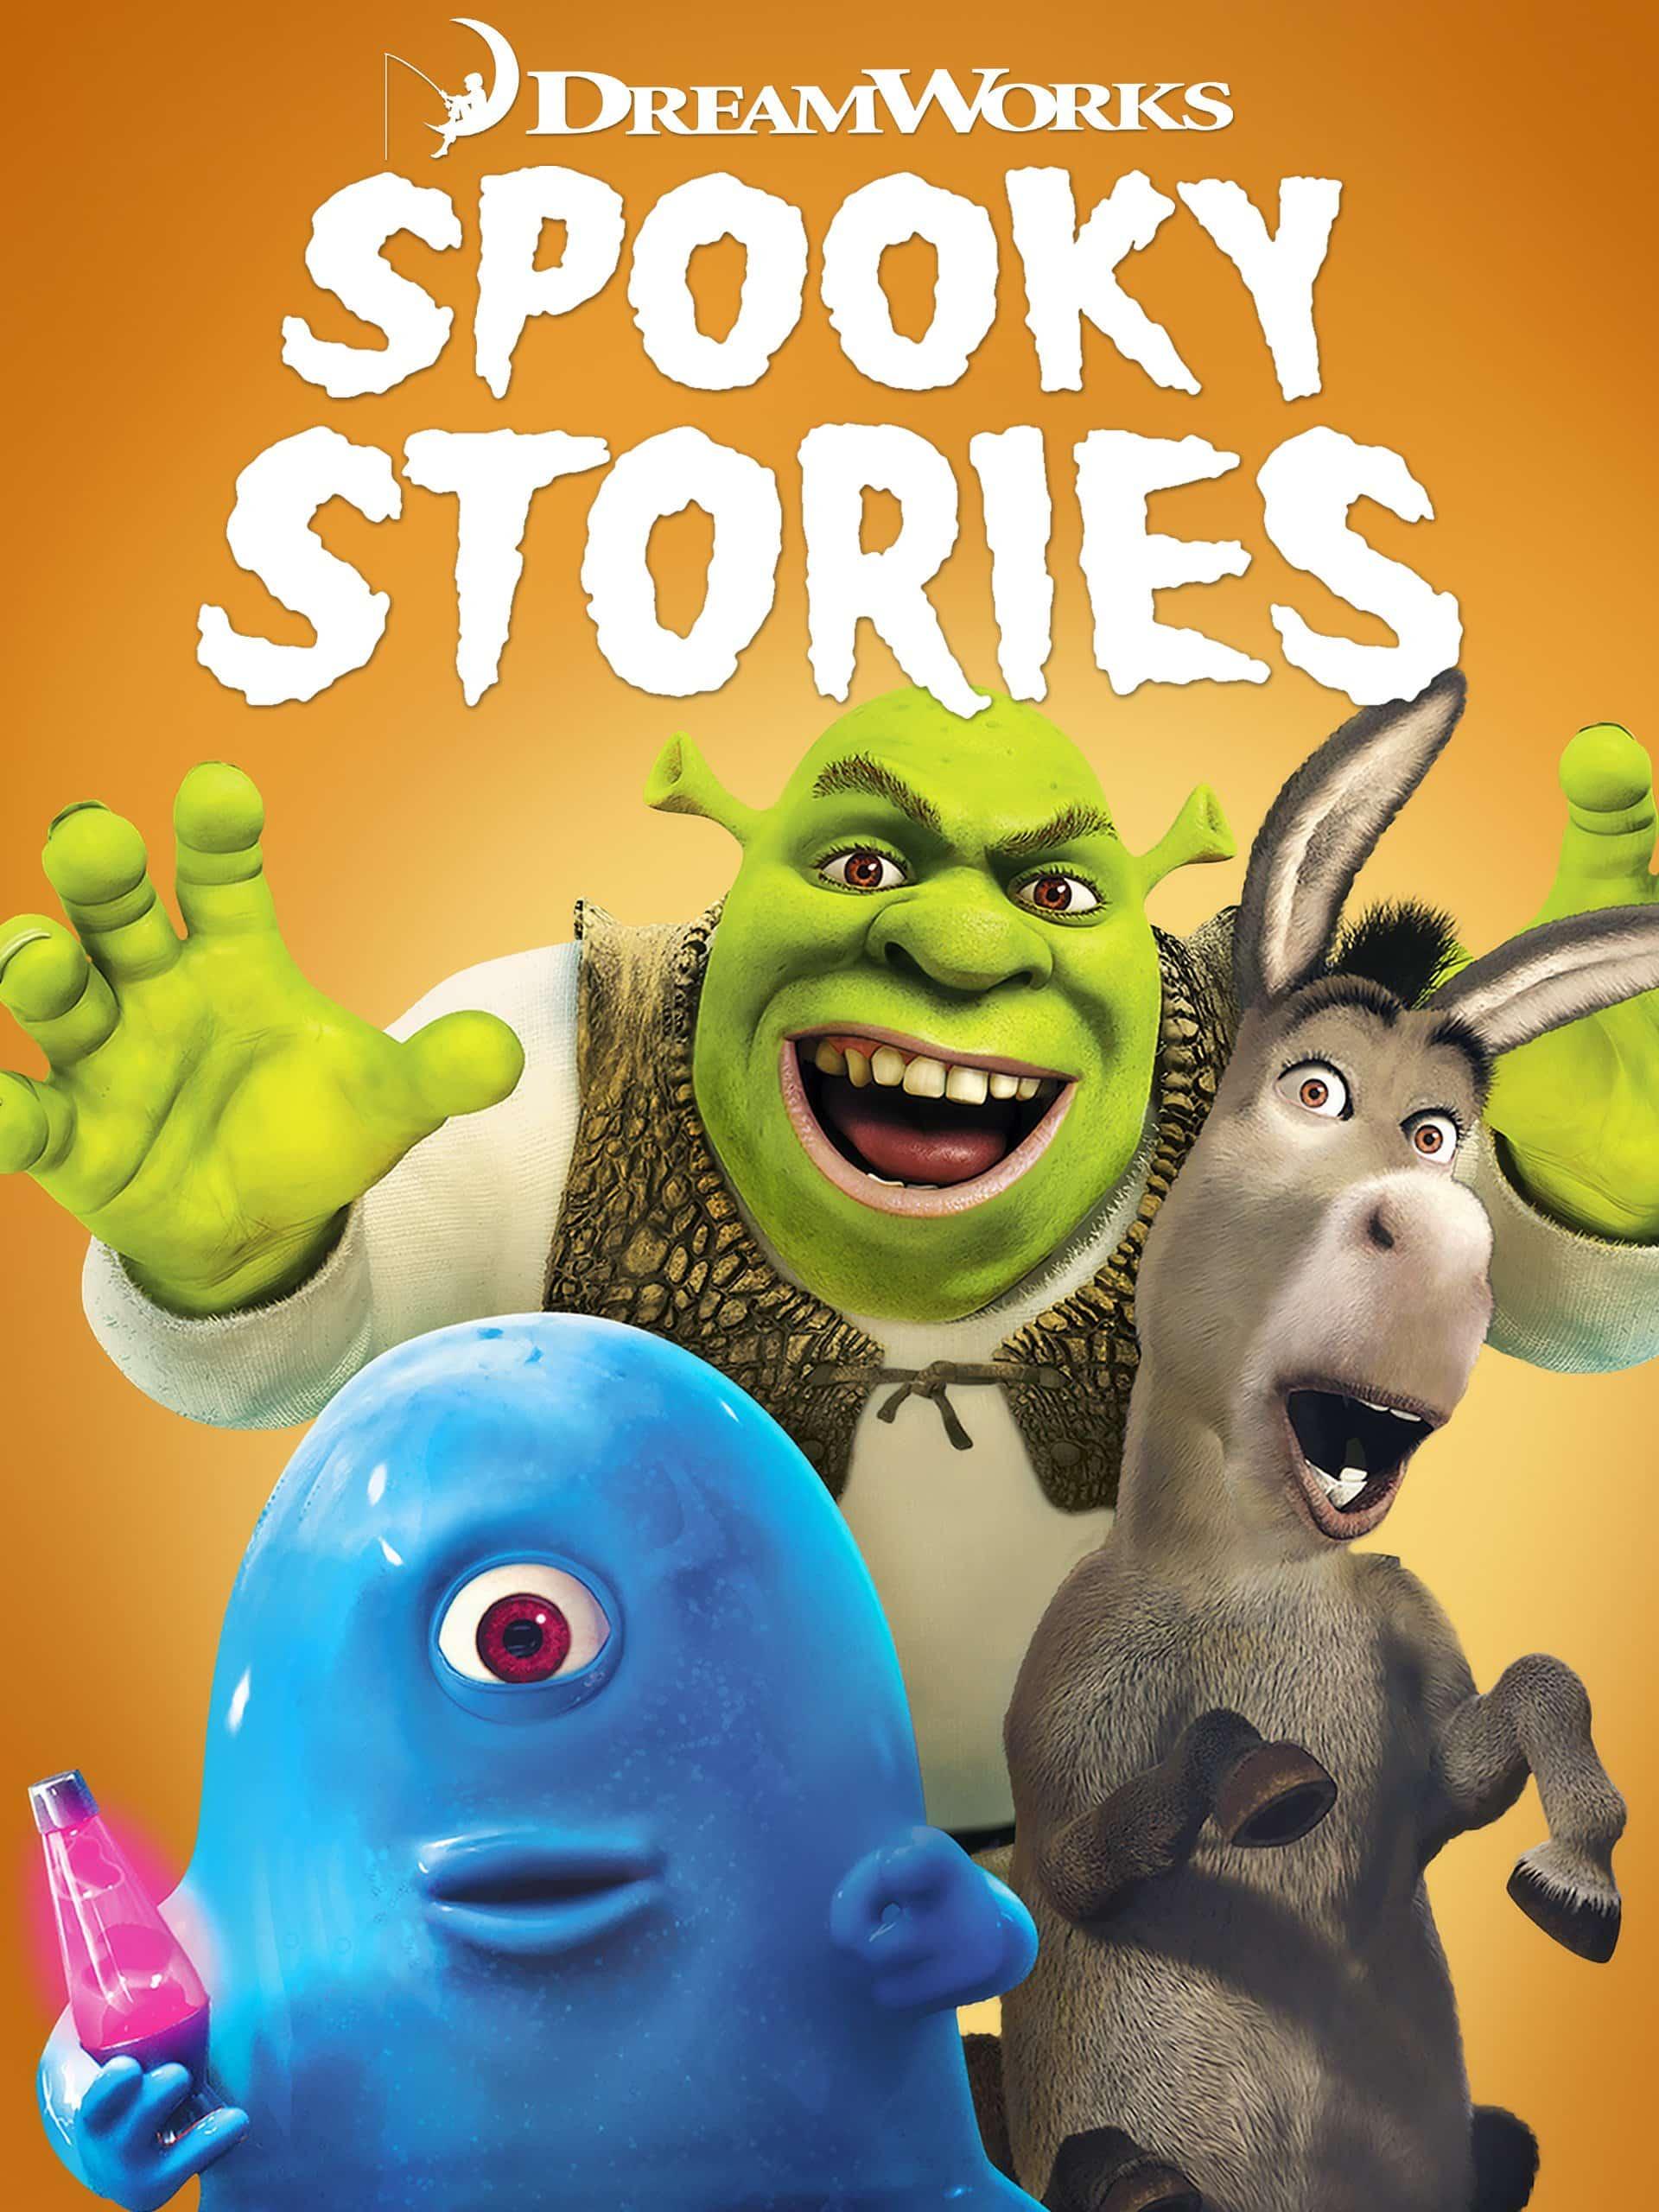 family halloween movies - Spooky Stories Shrek Animation, Family